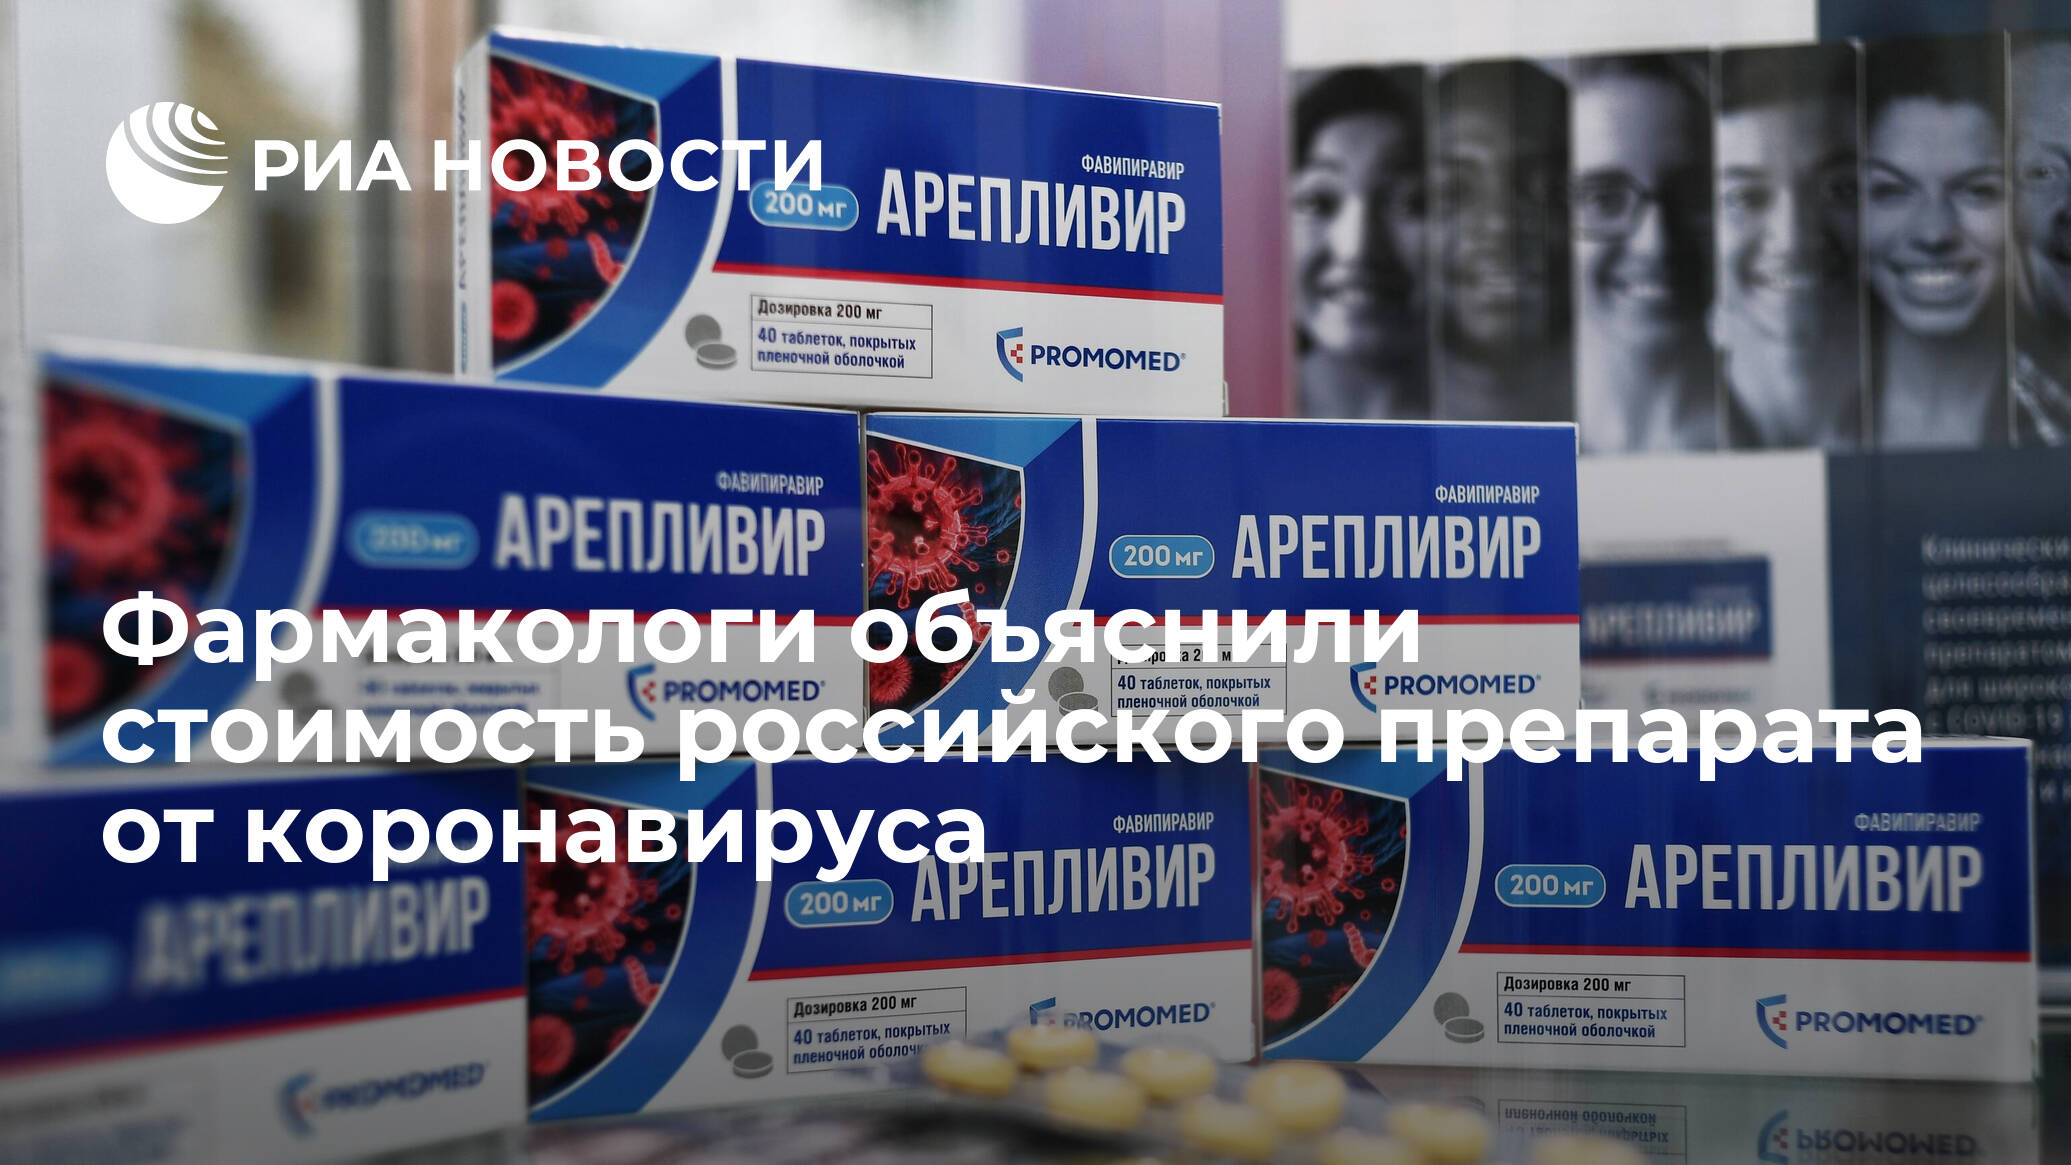 Фармакологи объяснили цену на российское лекарство от коронавируса